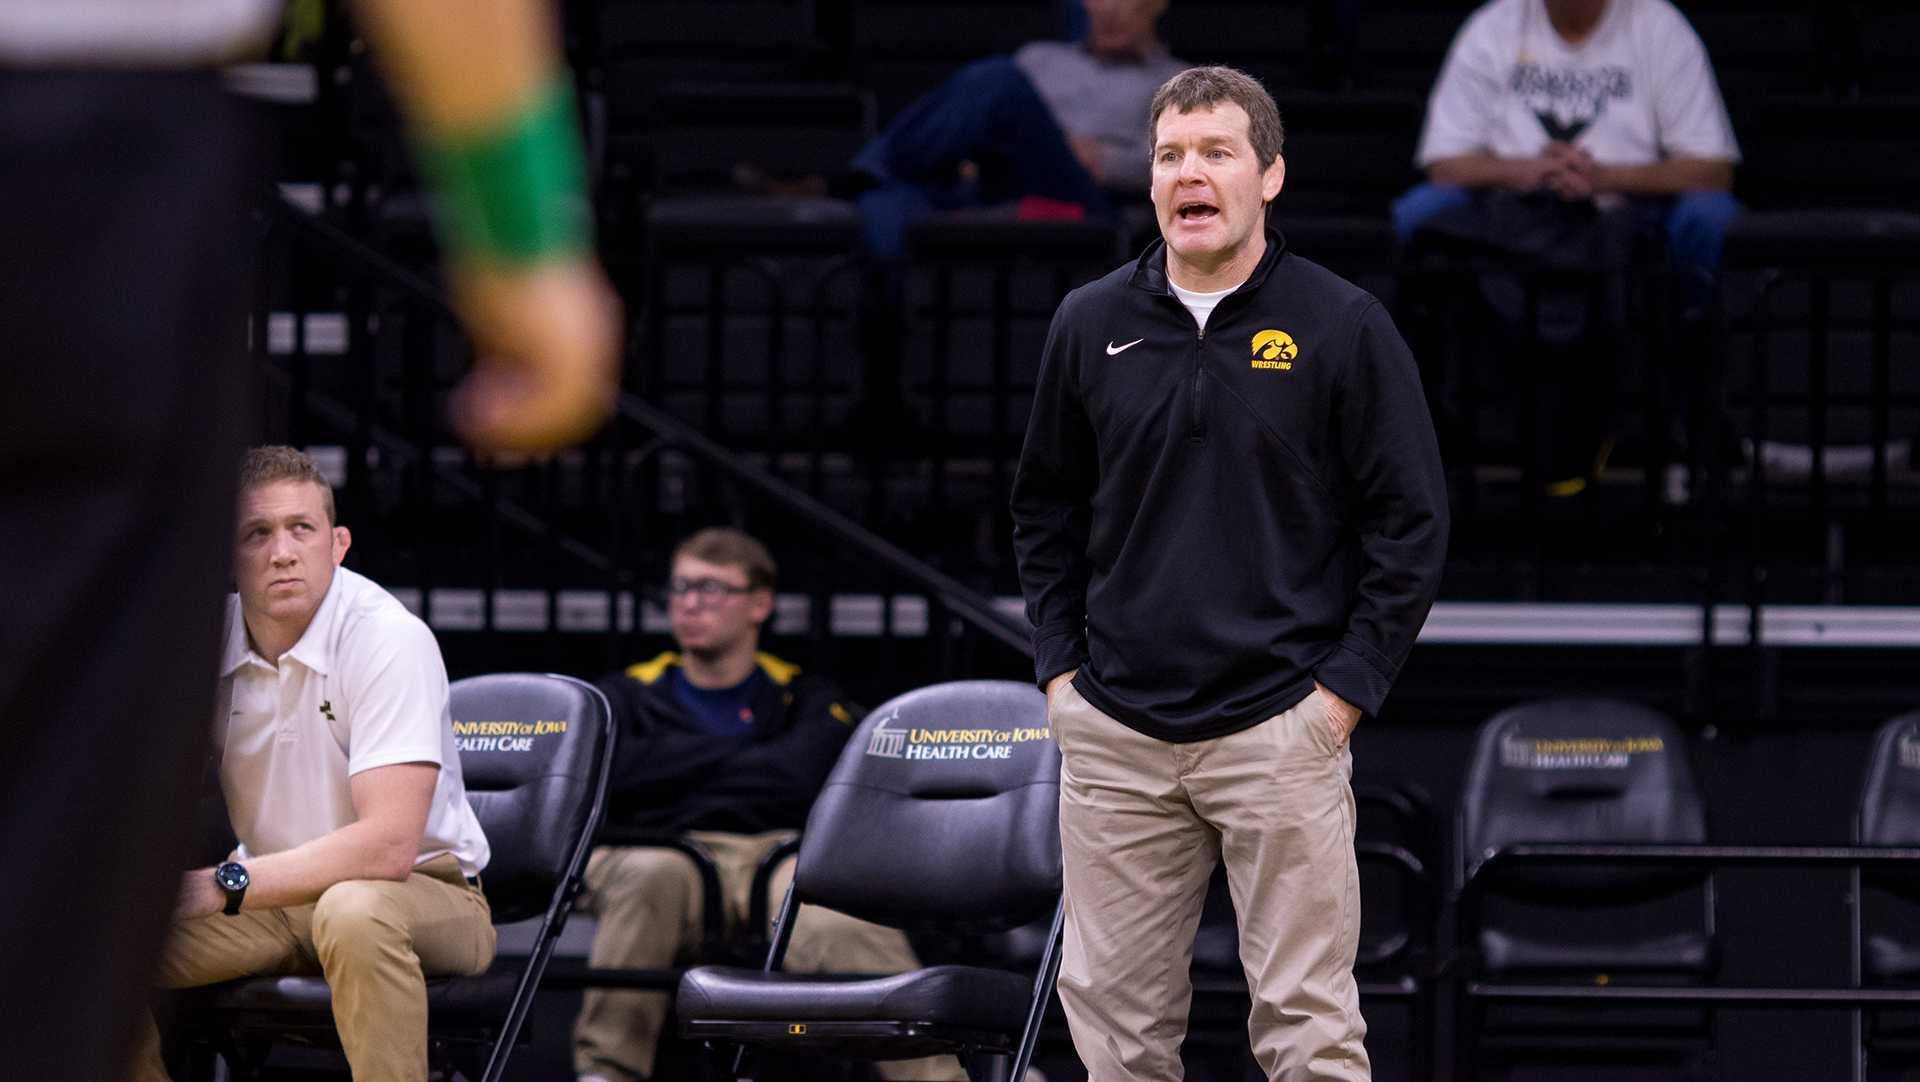 Iowa wrestling head coach Tom Brands watches his team wrestle on Friday, Nov. 17, 2017. (David Harmantas/The Daily Iowan)